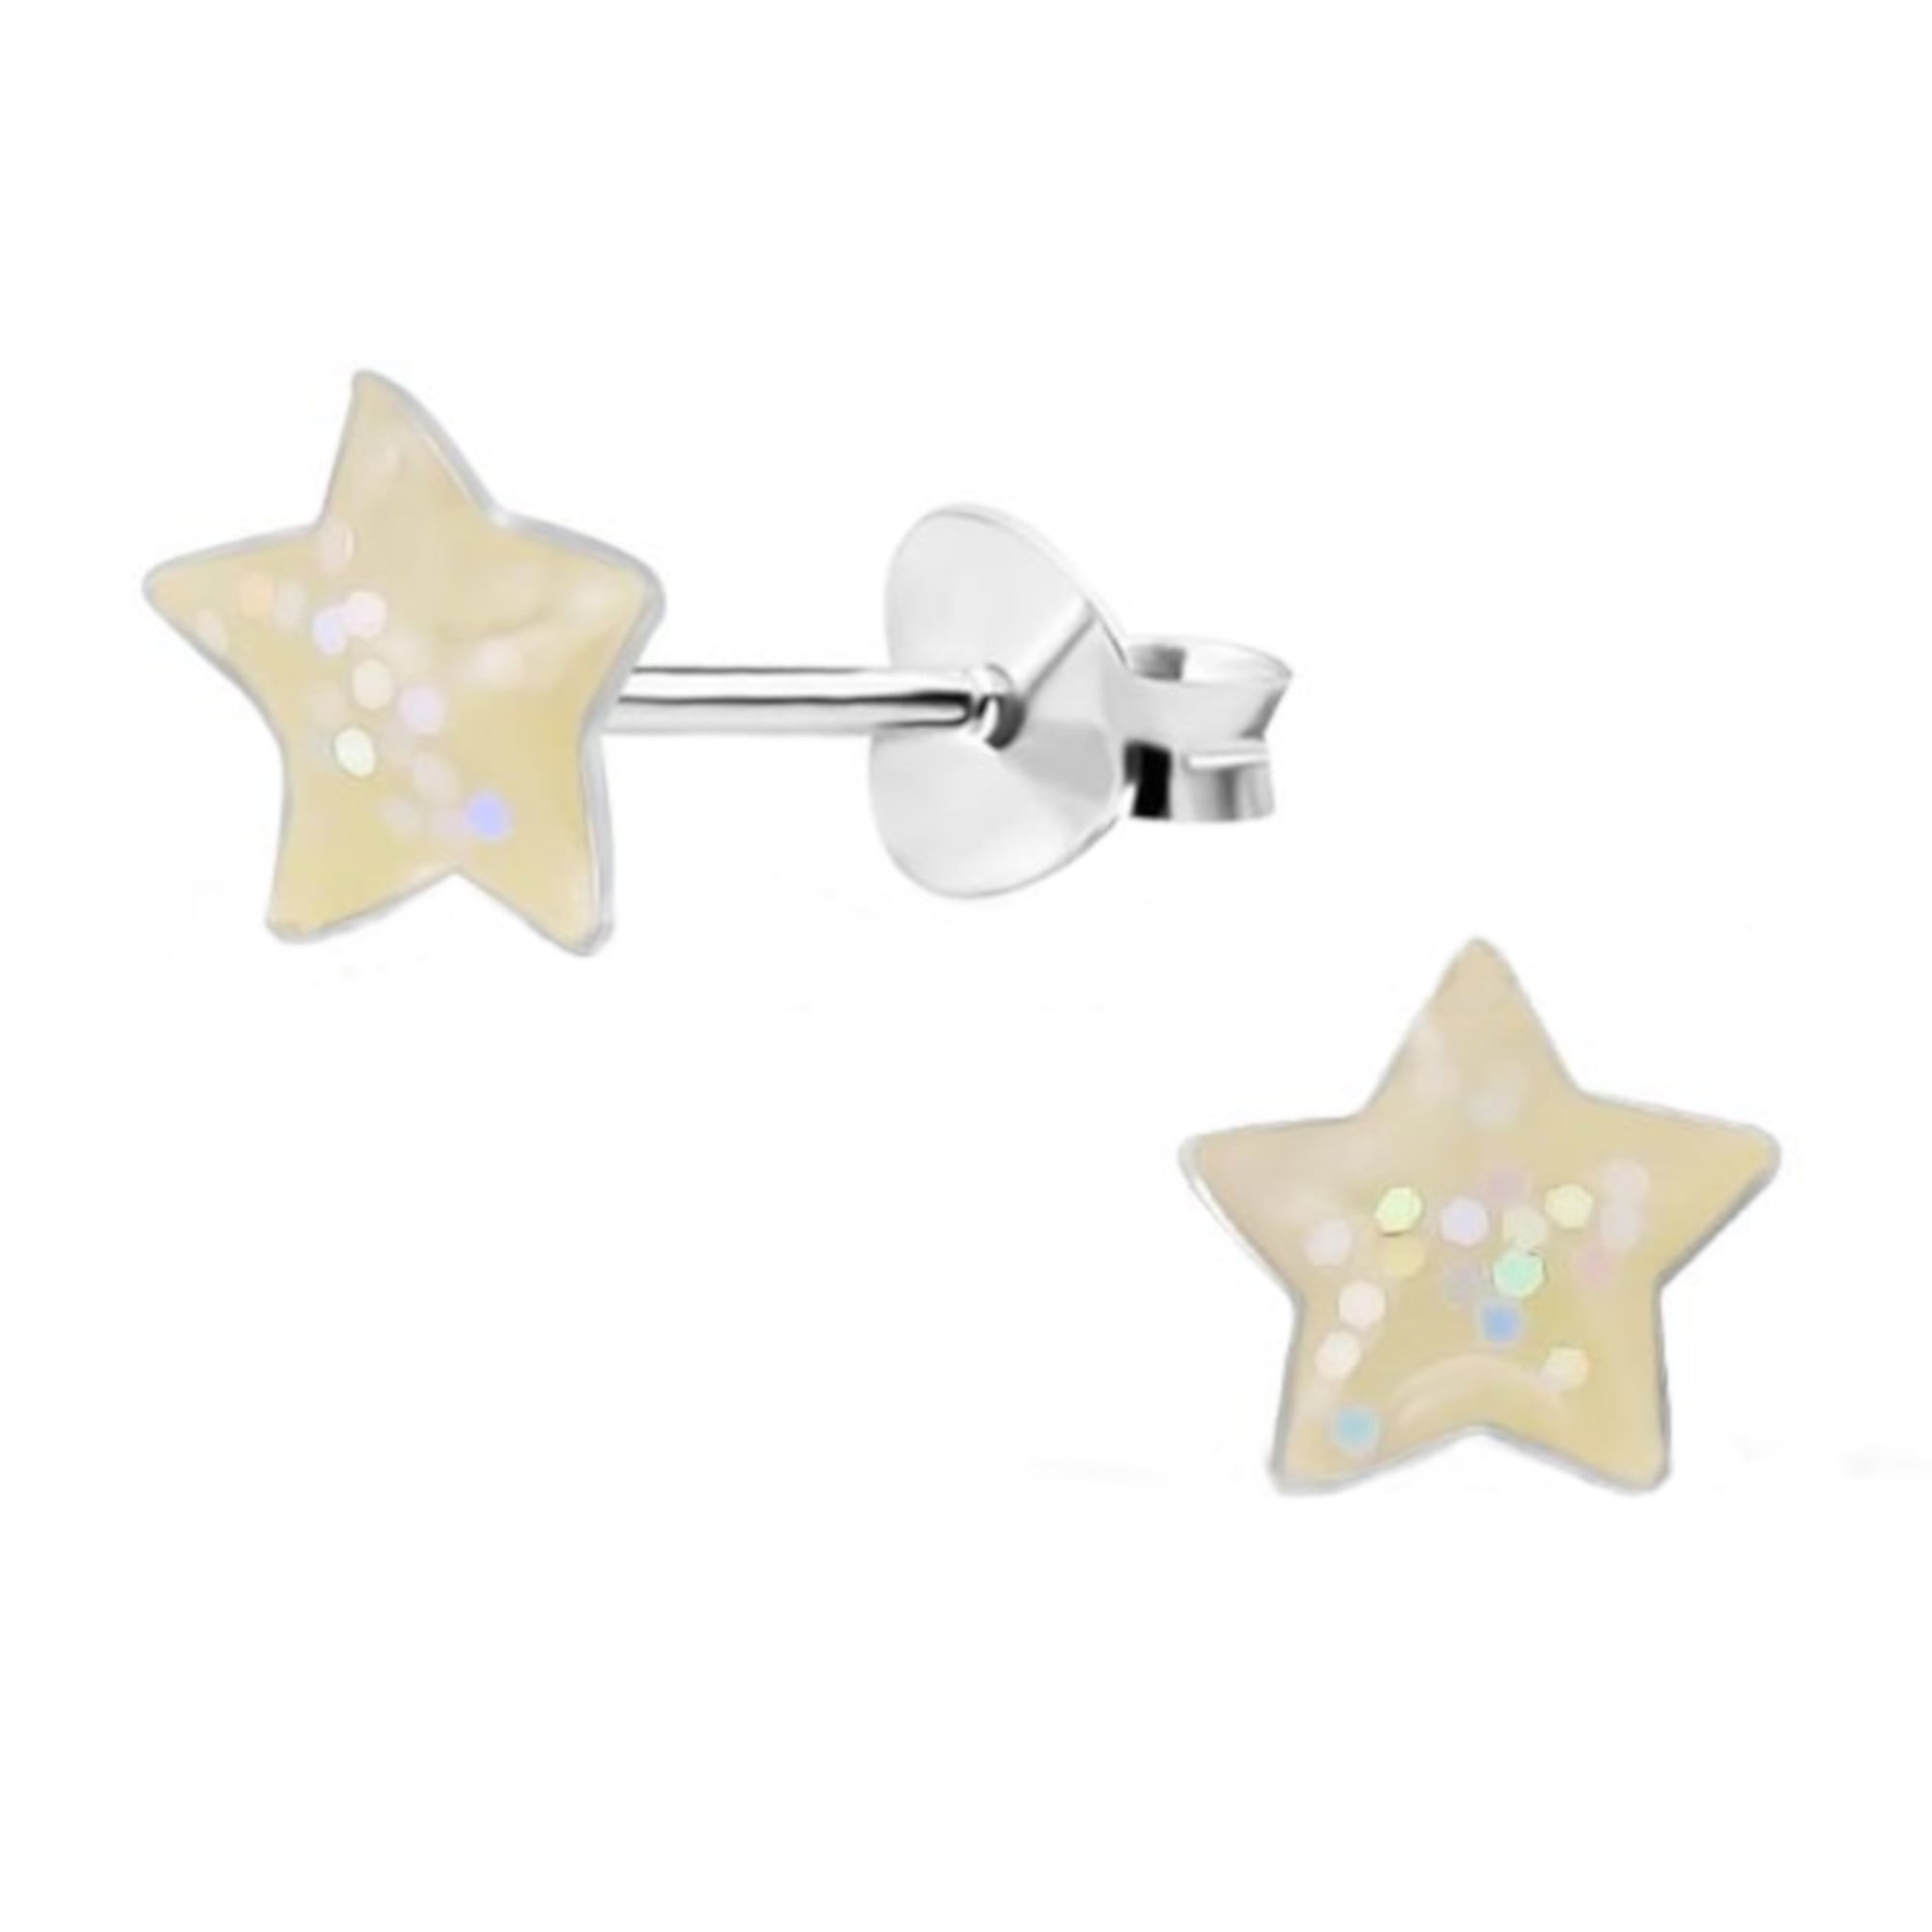 White glitter star earrings in sterling silver